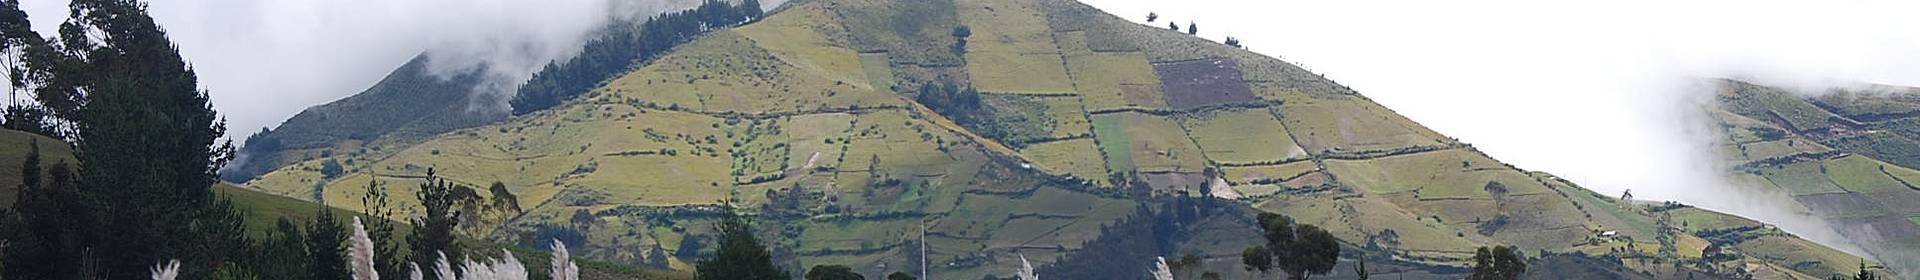 Chugchilan